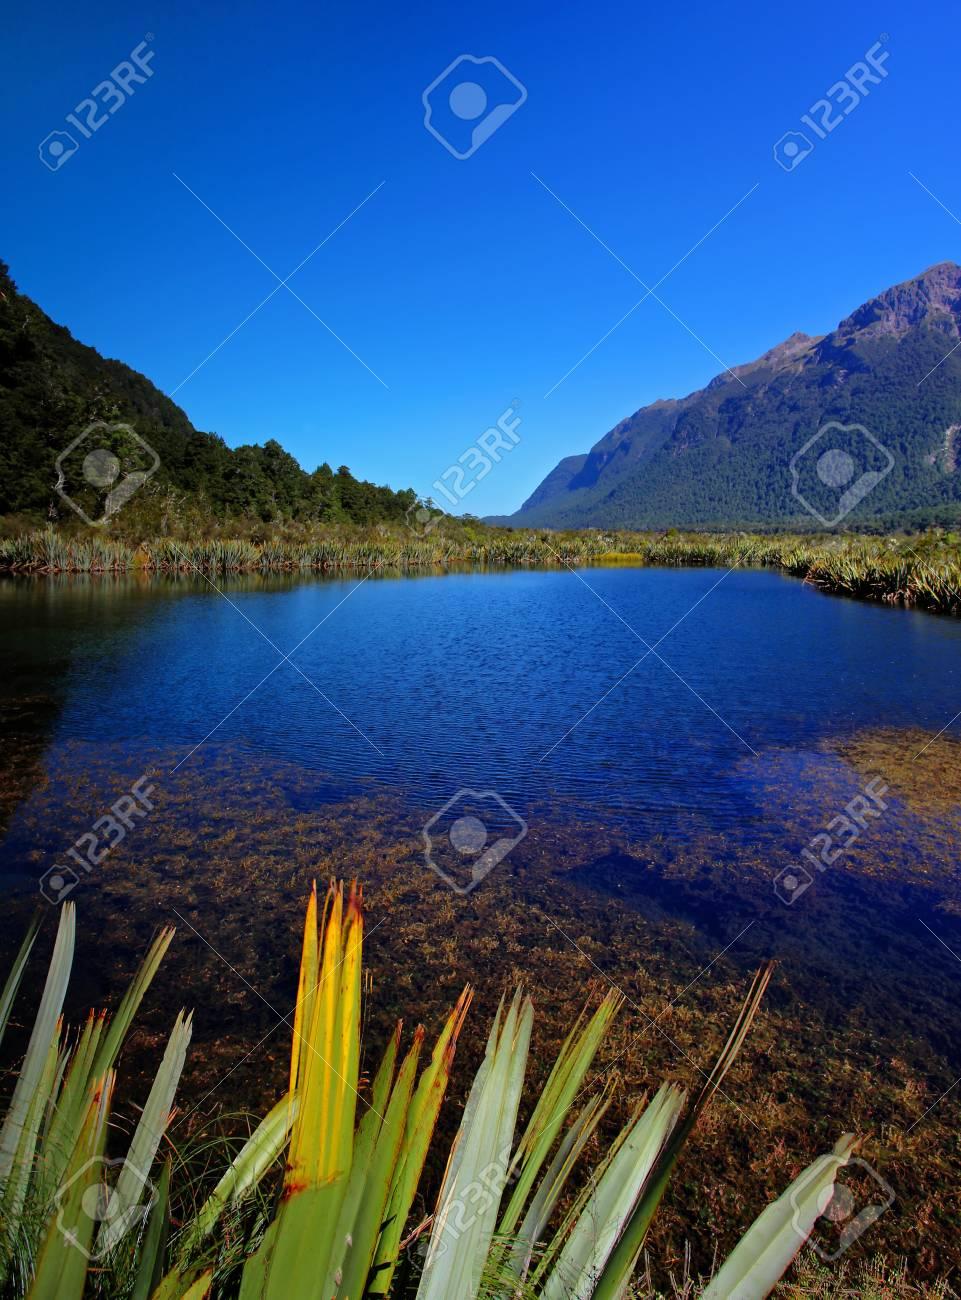 mirror lakes against blue sky Stock Photo - 9852824